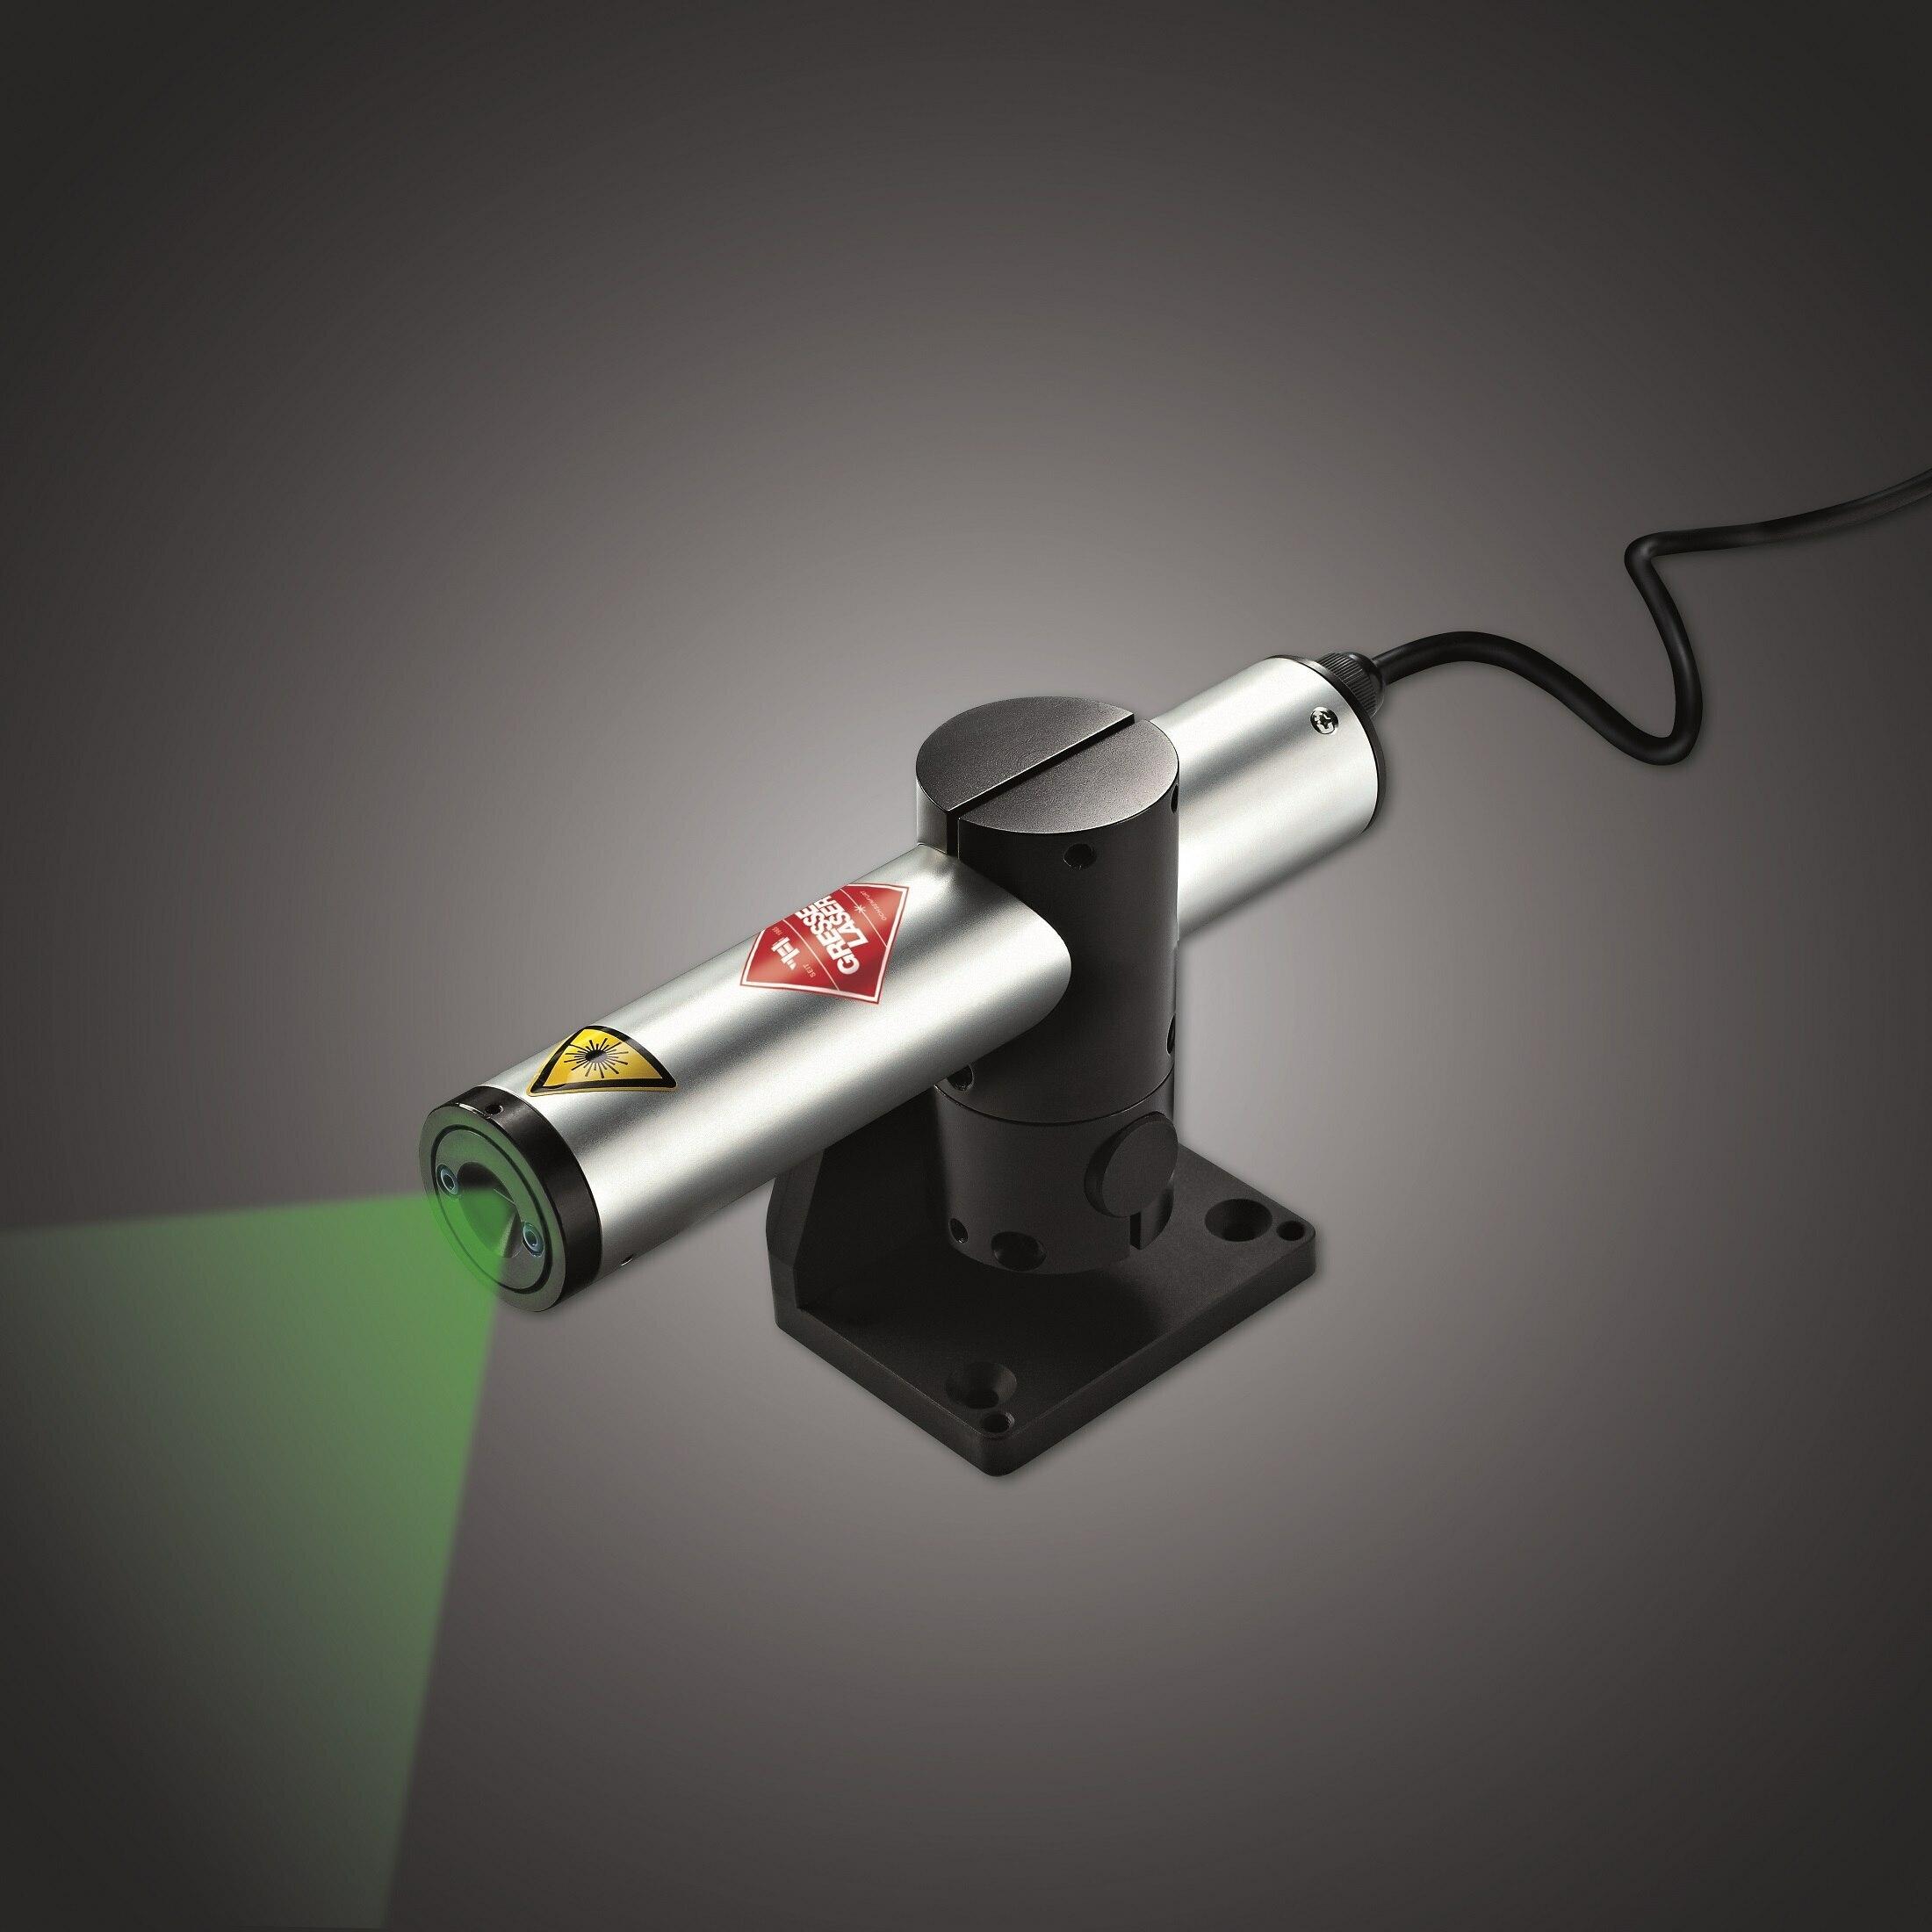 https://media.picotronic.de/products/ds_picture/lightbox/GS_linienlaser_composing_ld_laser_mount_fond_gruenerlaser_2200x2200.jpg